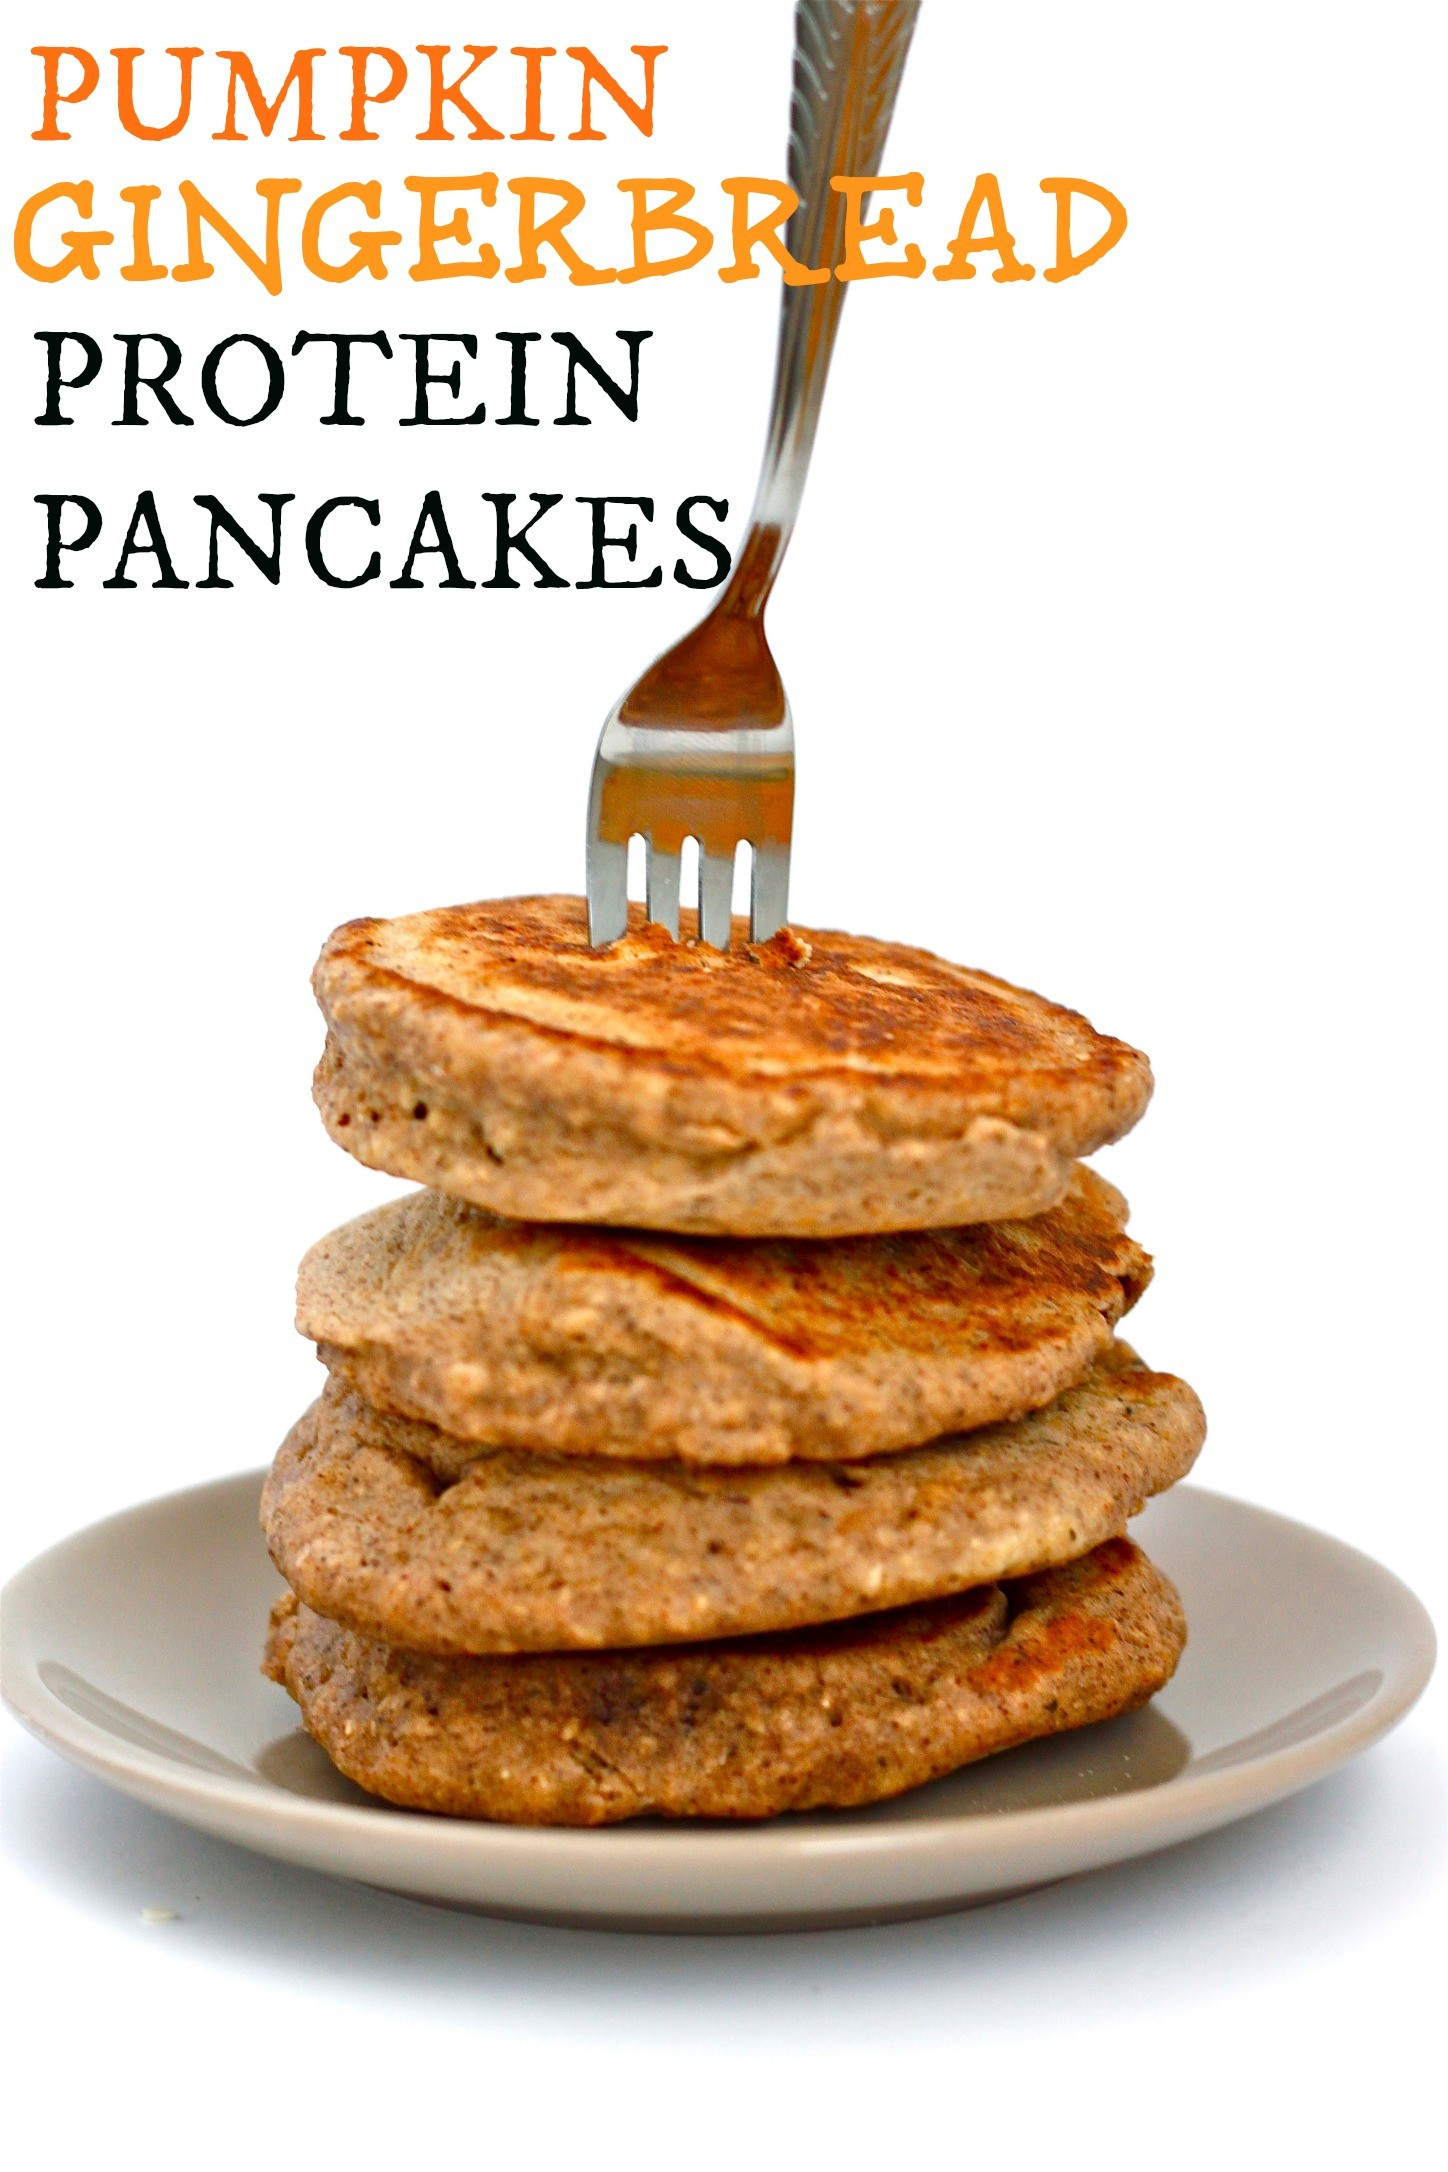 Pumpkin Protein Pancakes  Pumpkin Gingerbread Protein Pancakes